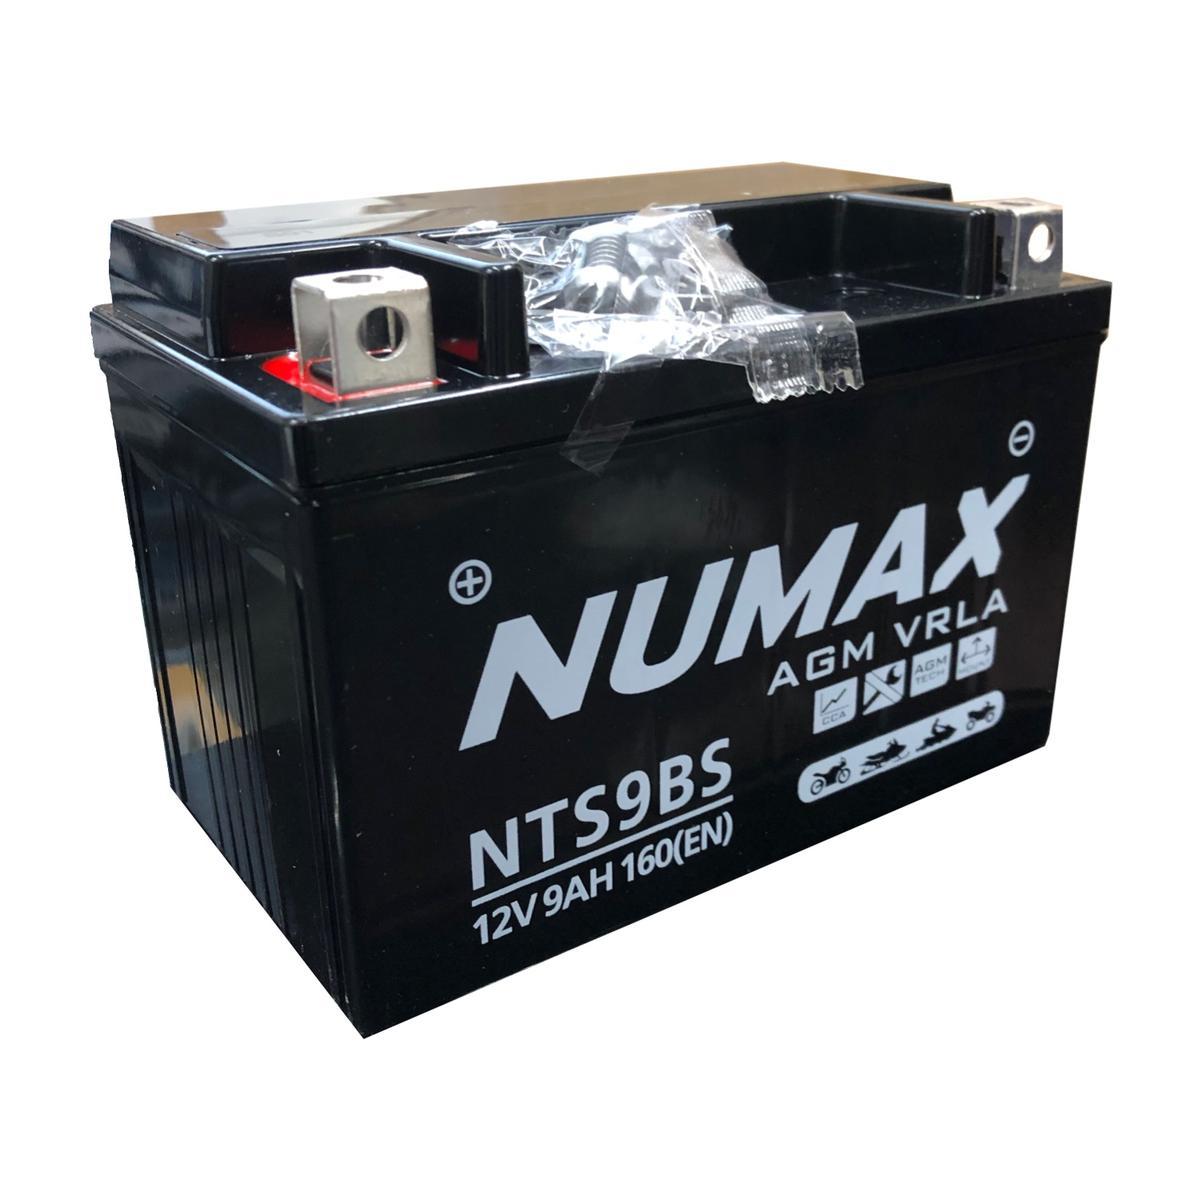 Numax NTS9BS 12v Motorbike Bike Battery KTM 650 650cc Adventurer YXT9-4